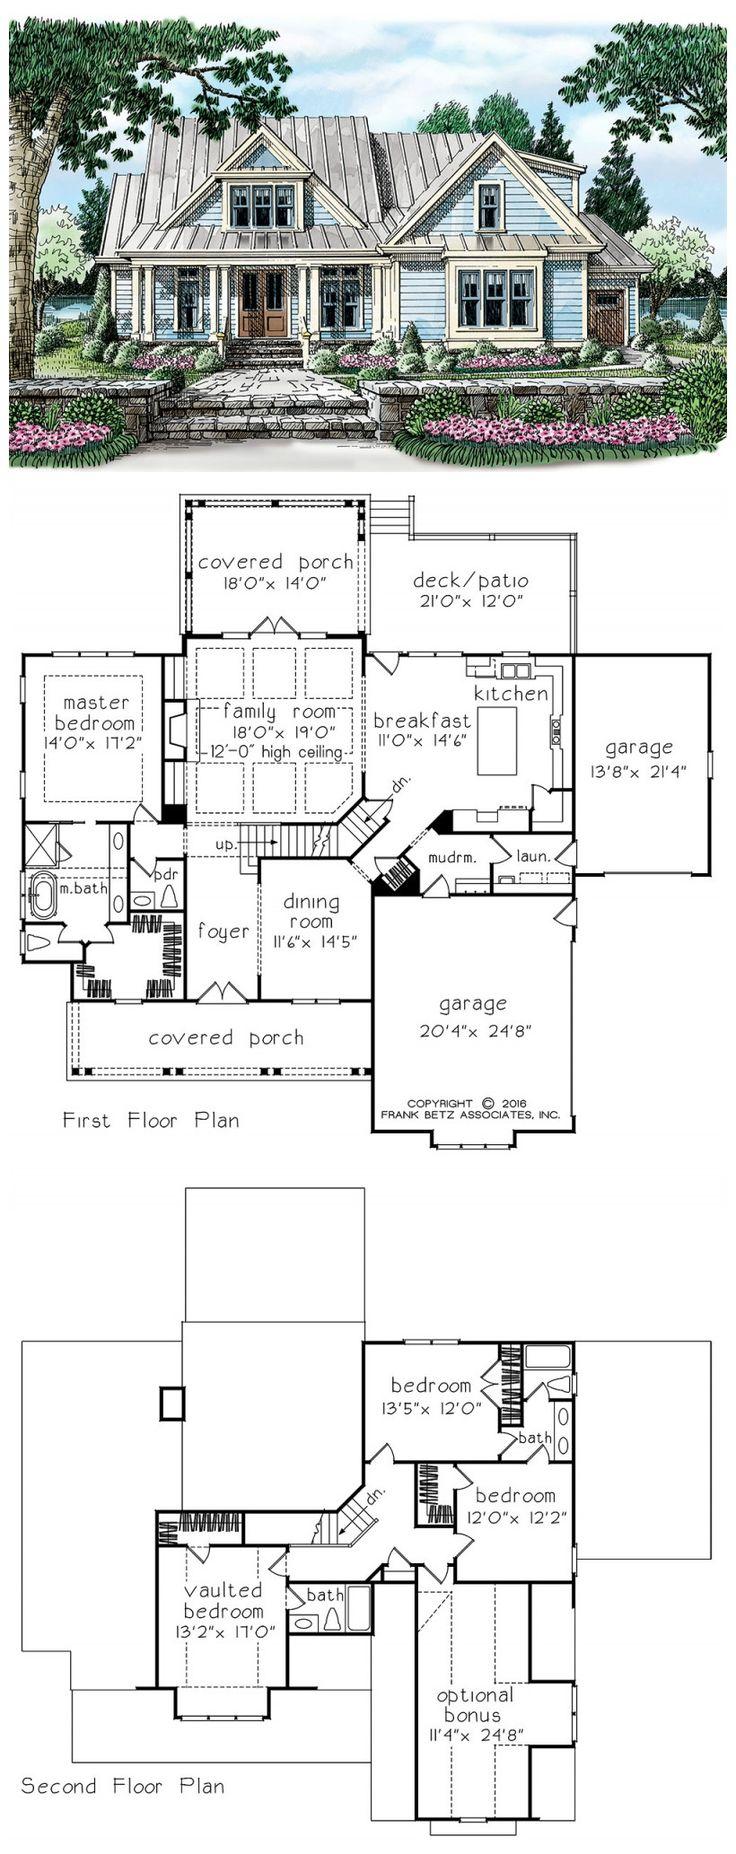 Betz house plans with large kitchen frank house plans designs ideas - Frank Betz Has An Available Floor Plan Entitled Ansonborough House Floor Plan